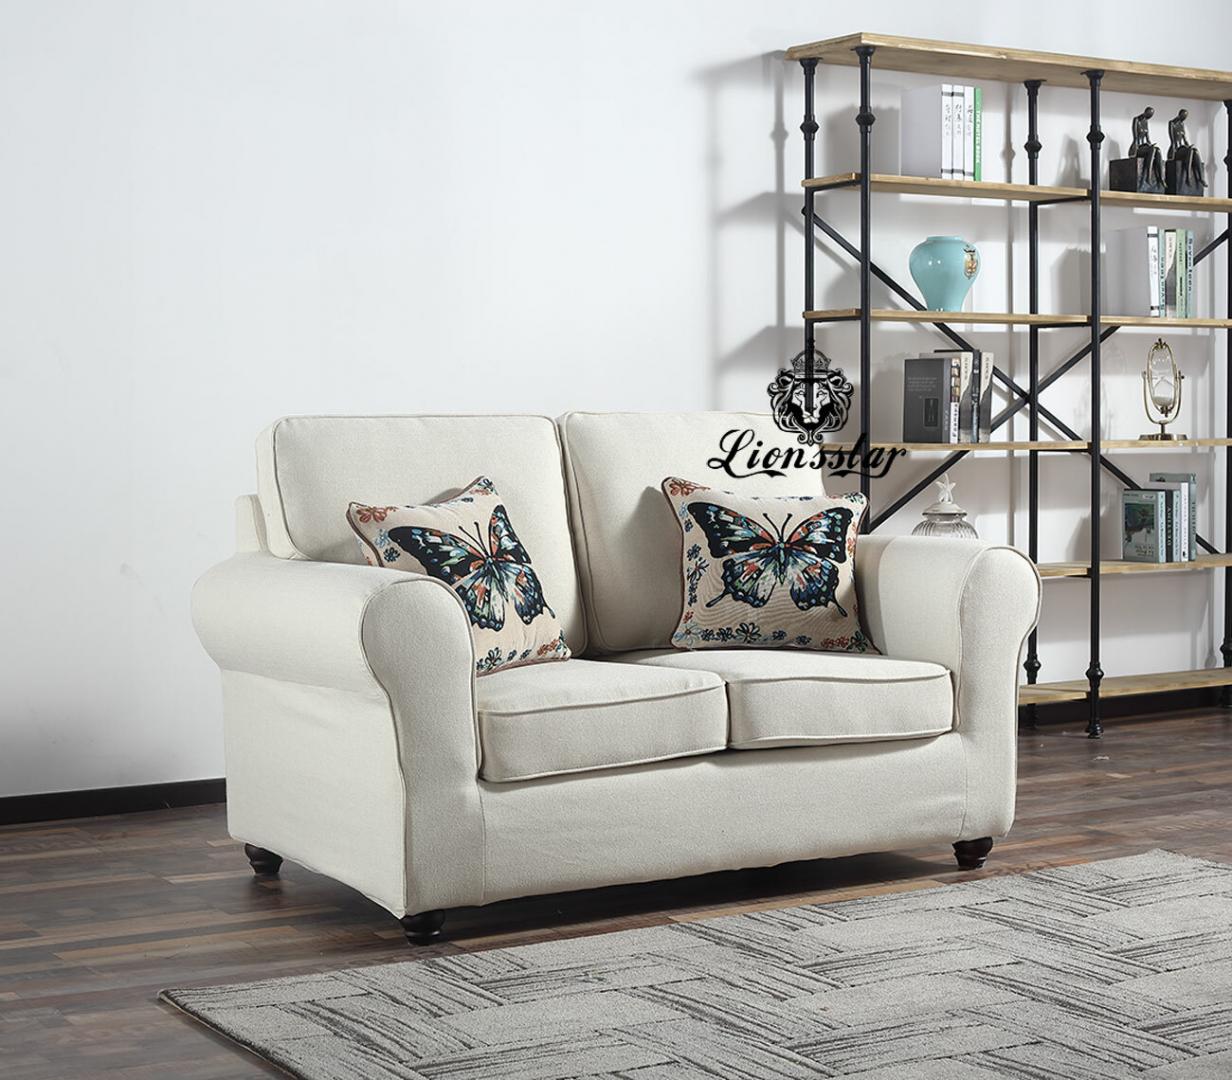 Design Sofa Set Norderney Creme Weiß